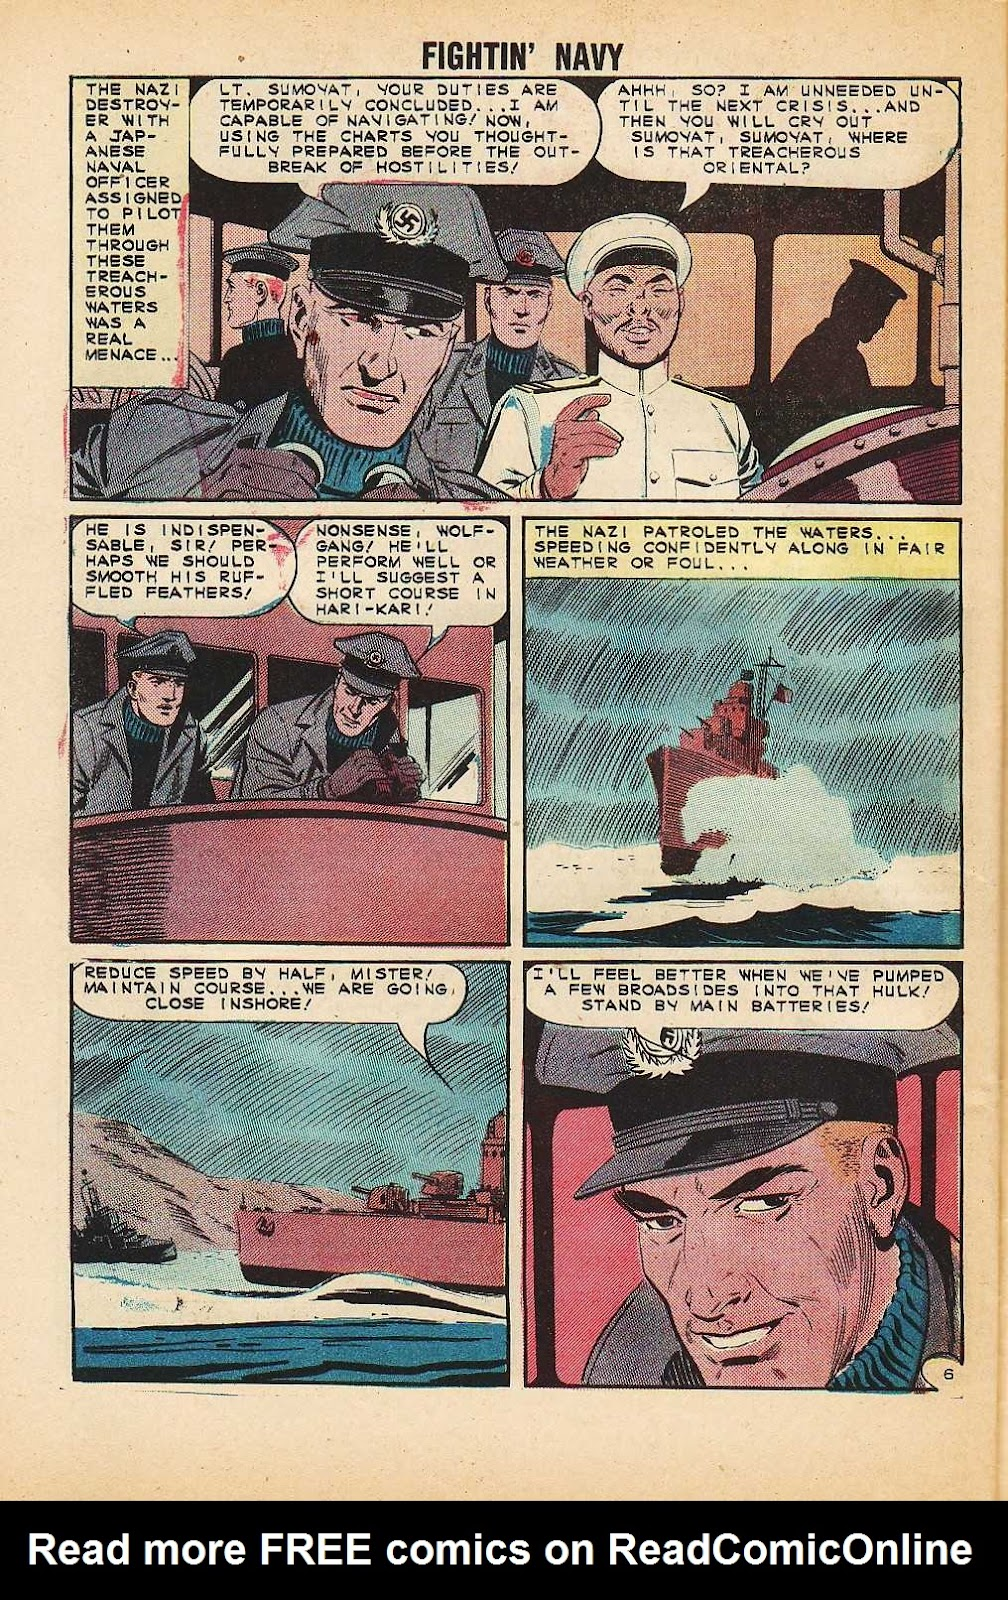 Read online Fightin' Navy comic -  Issue #116 - 32